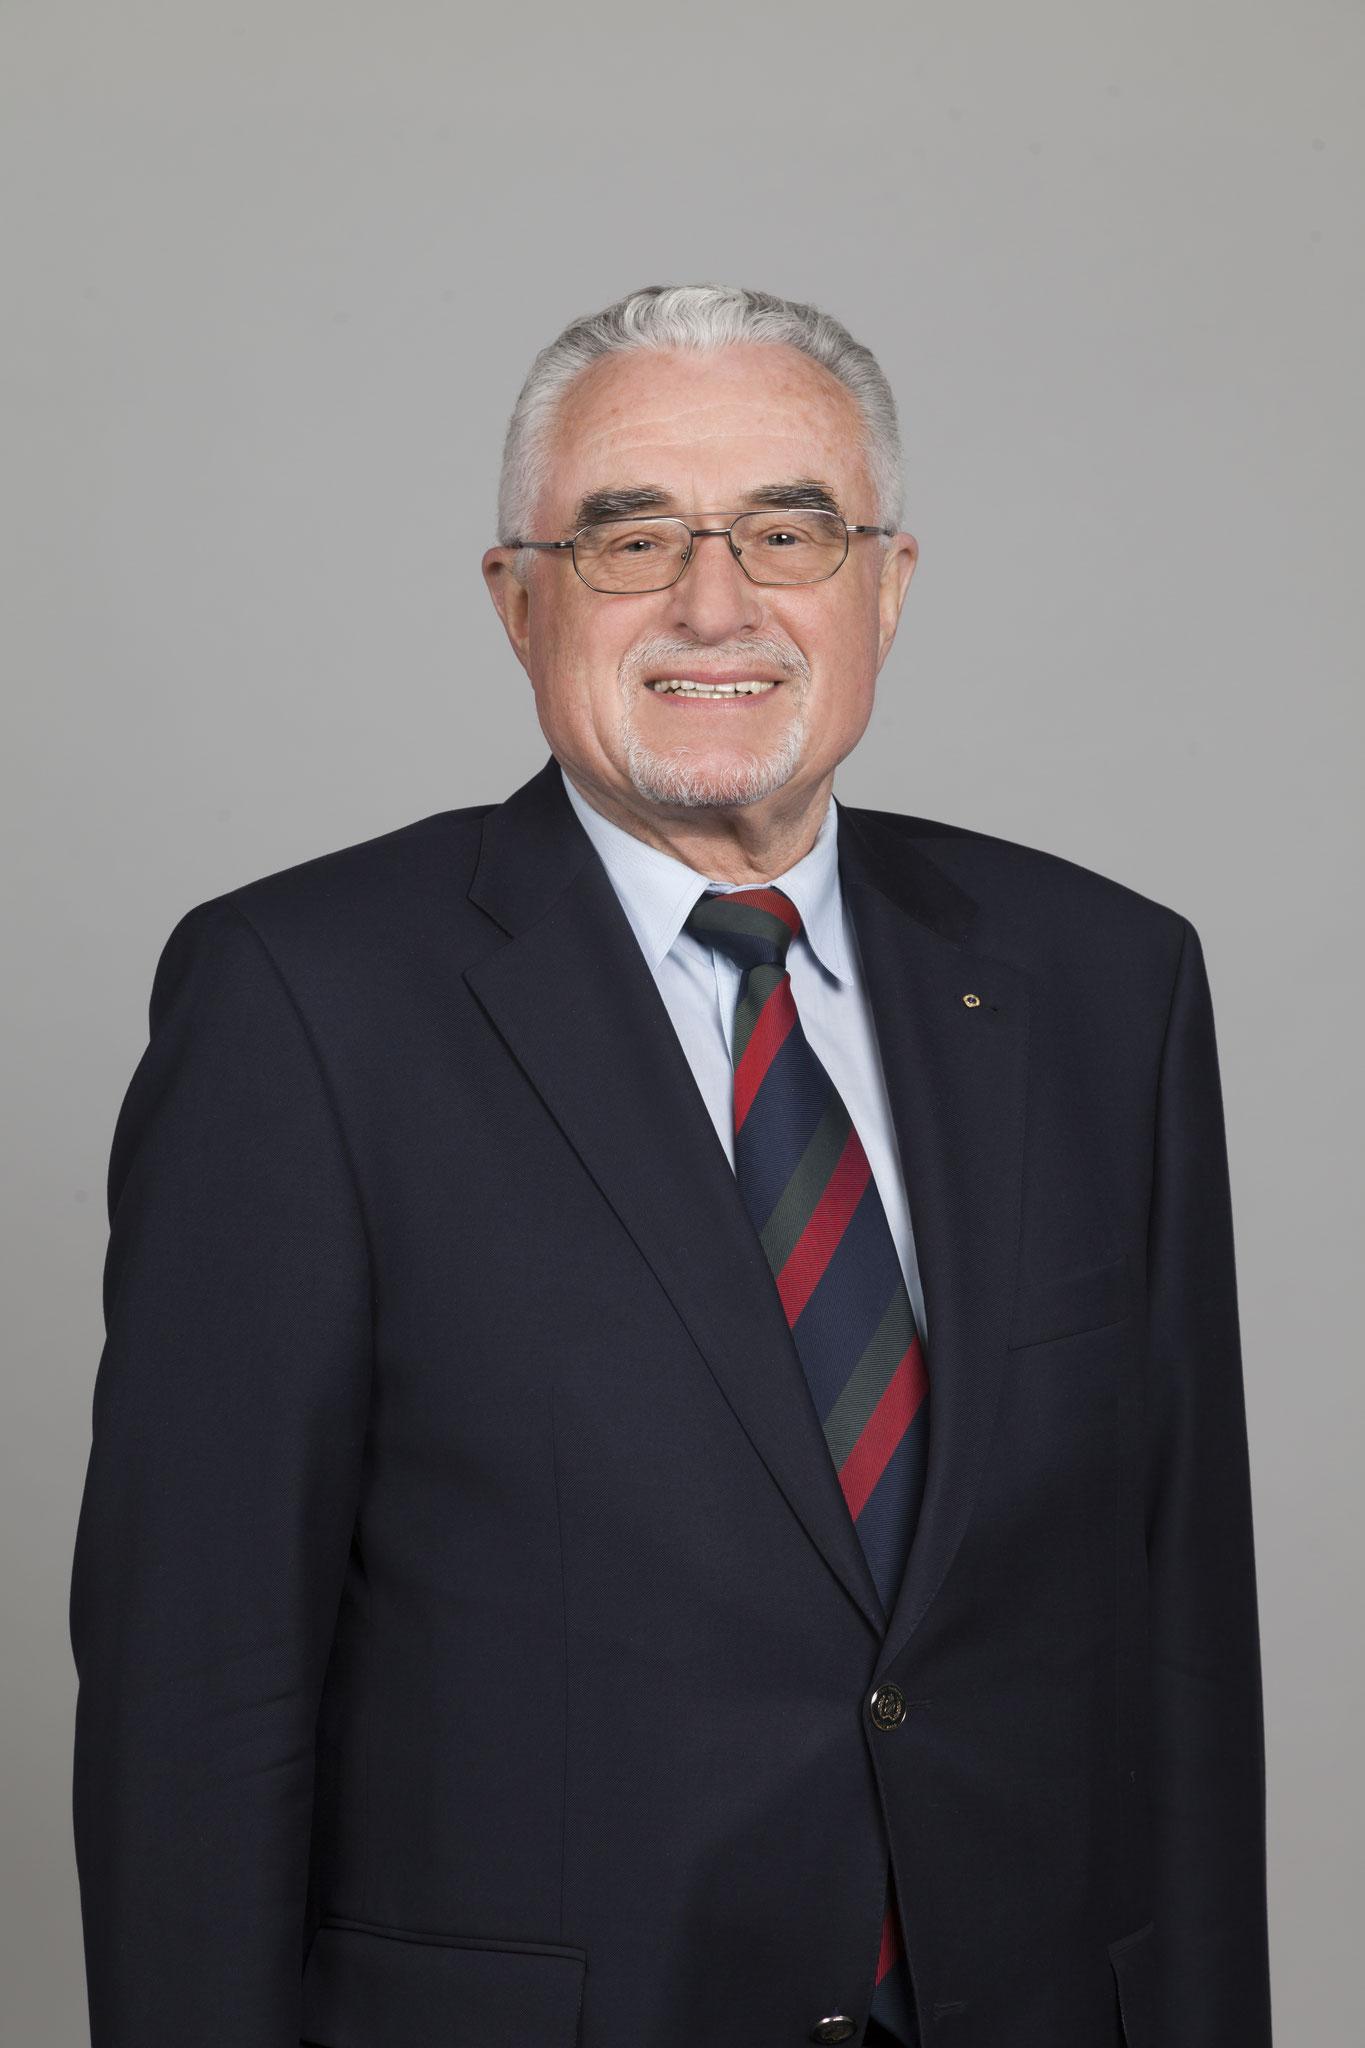 Dr. Gerhard Scharf